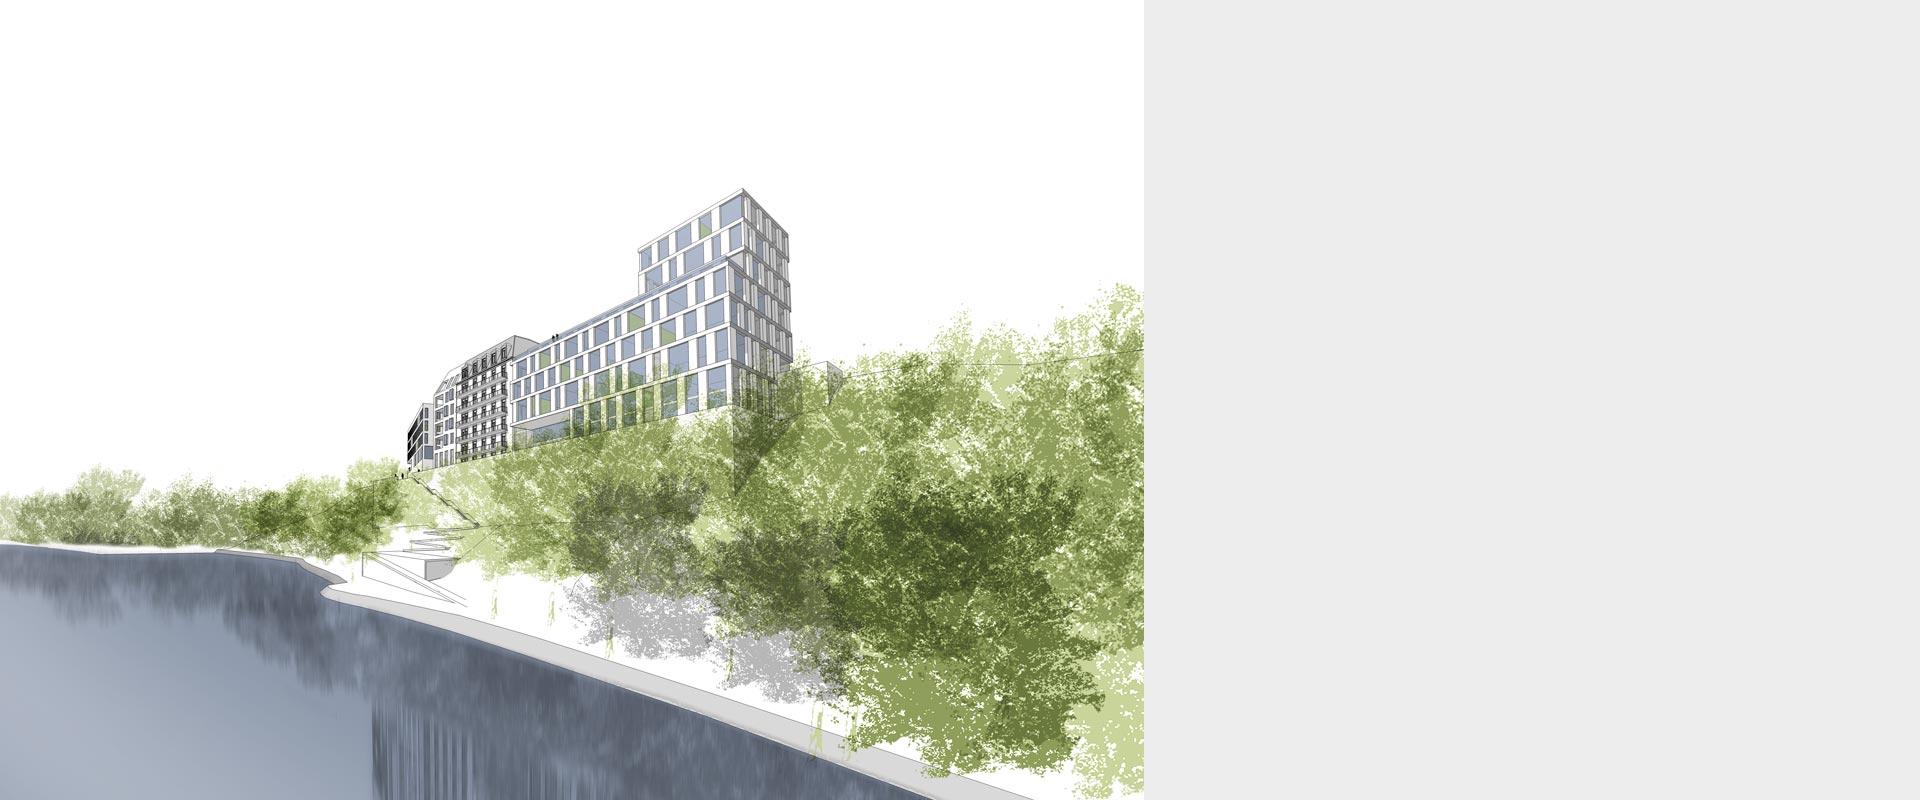 architekturbuero_henning_musahl_waldshut_stadtschloss_02